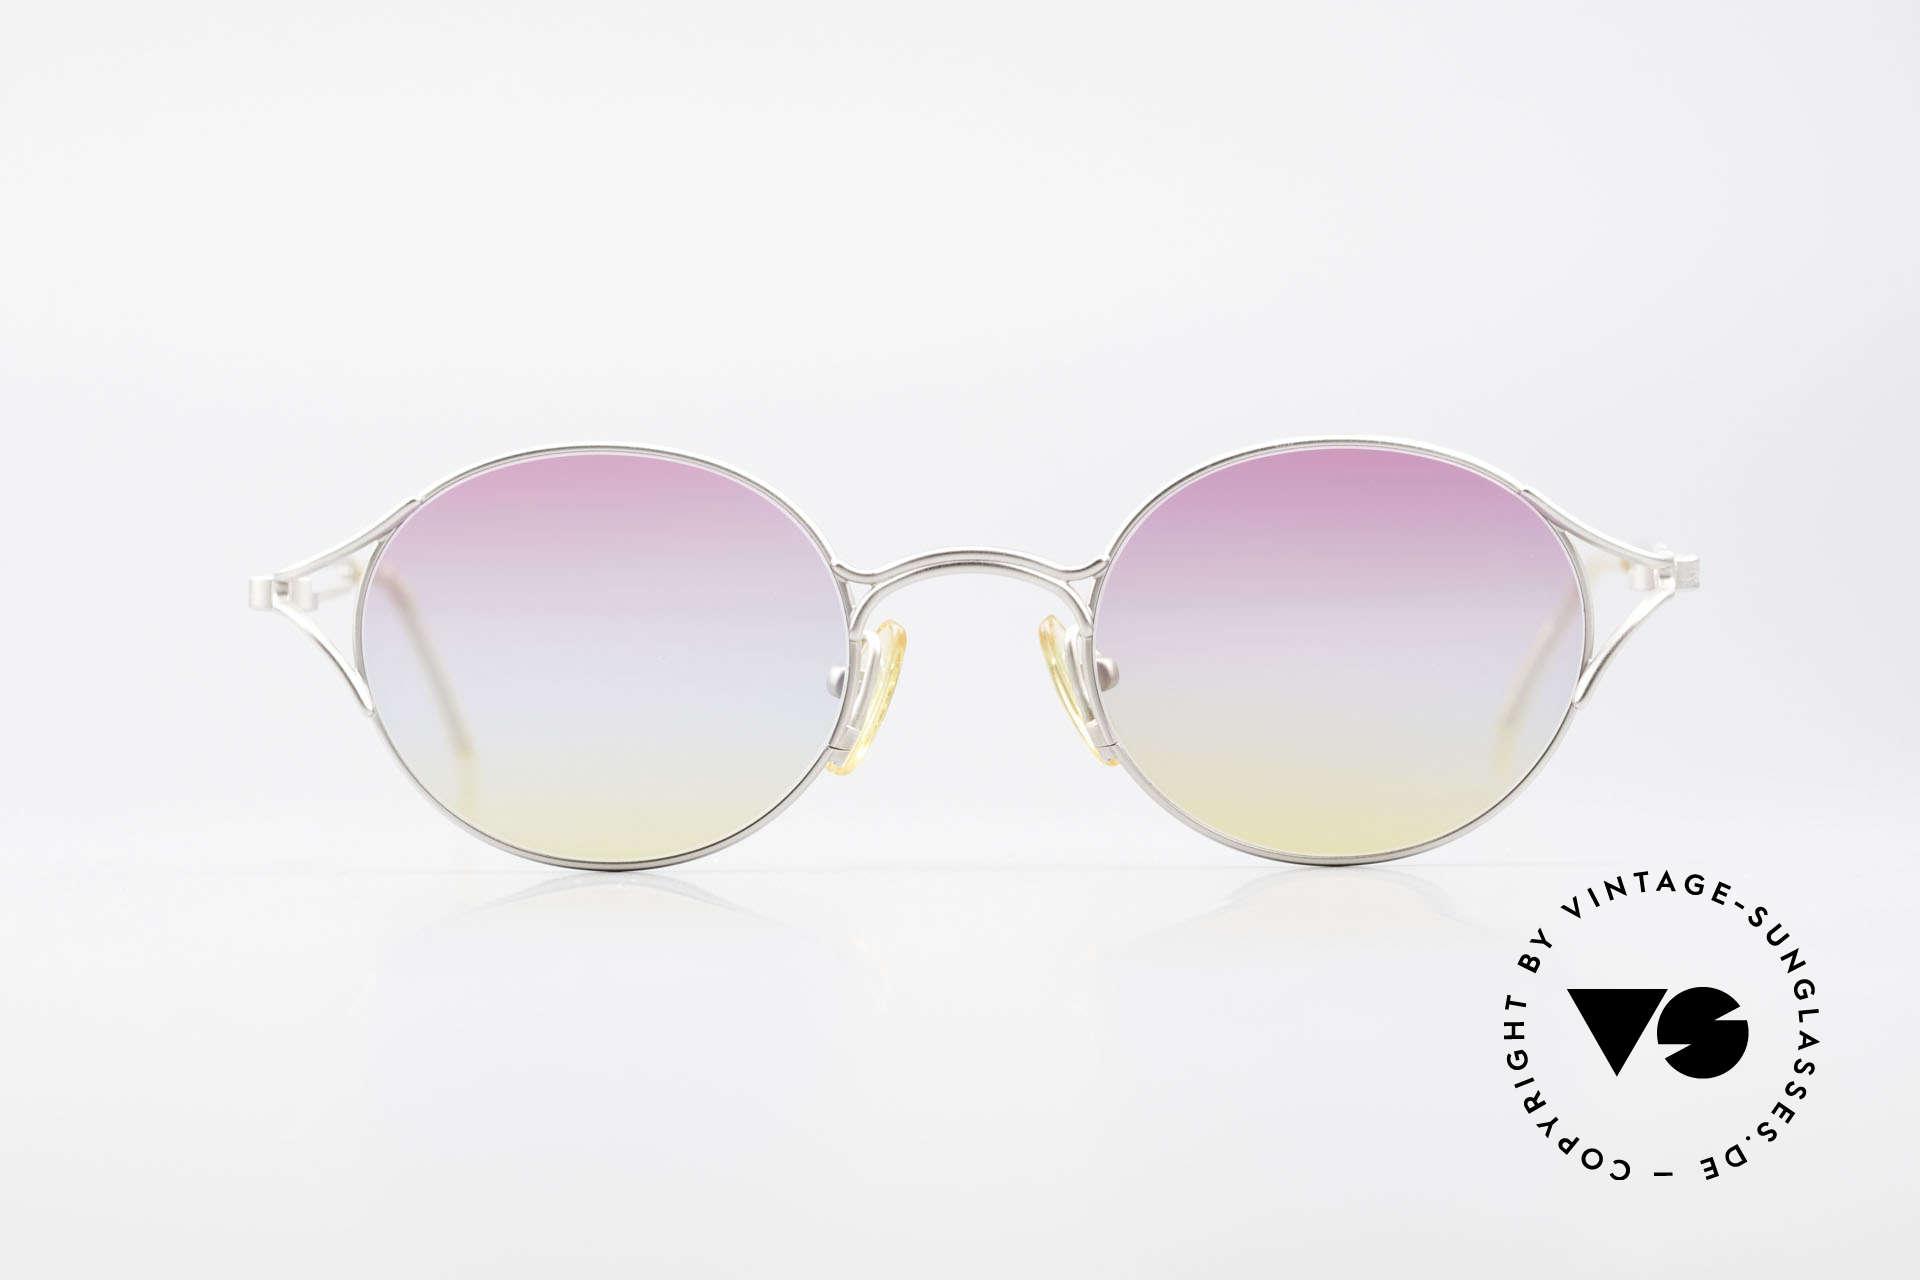 Yohji Yamamoto 51-4103 Panto Designer Sunglasses, 1st class craftsmanship and materials (lightweight titan), Made for Men and Women